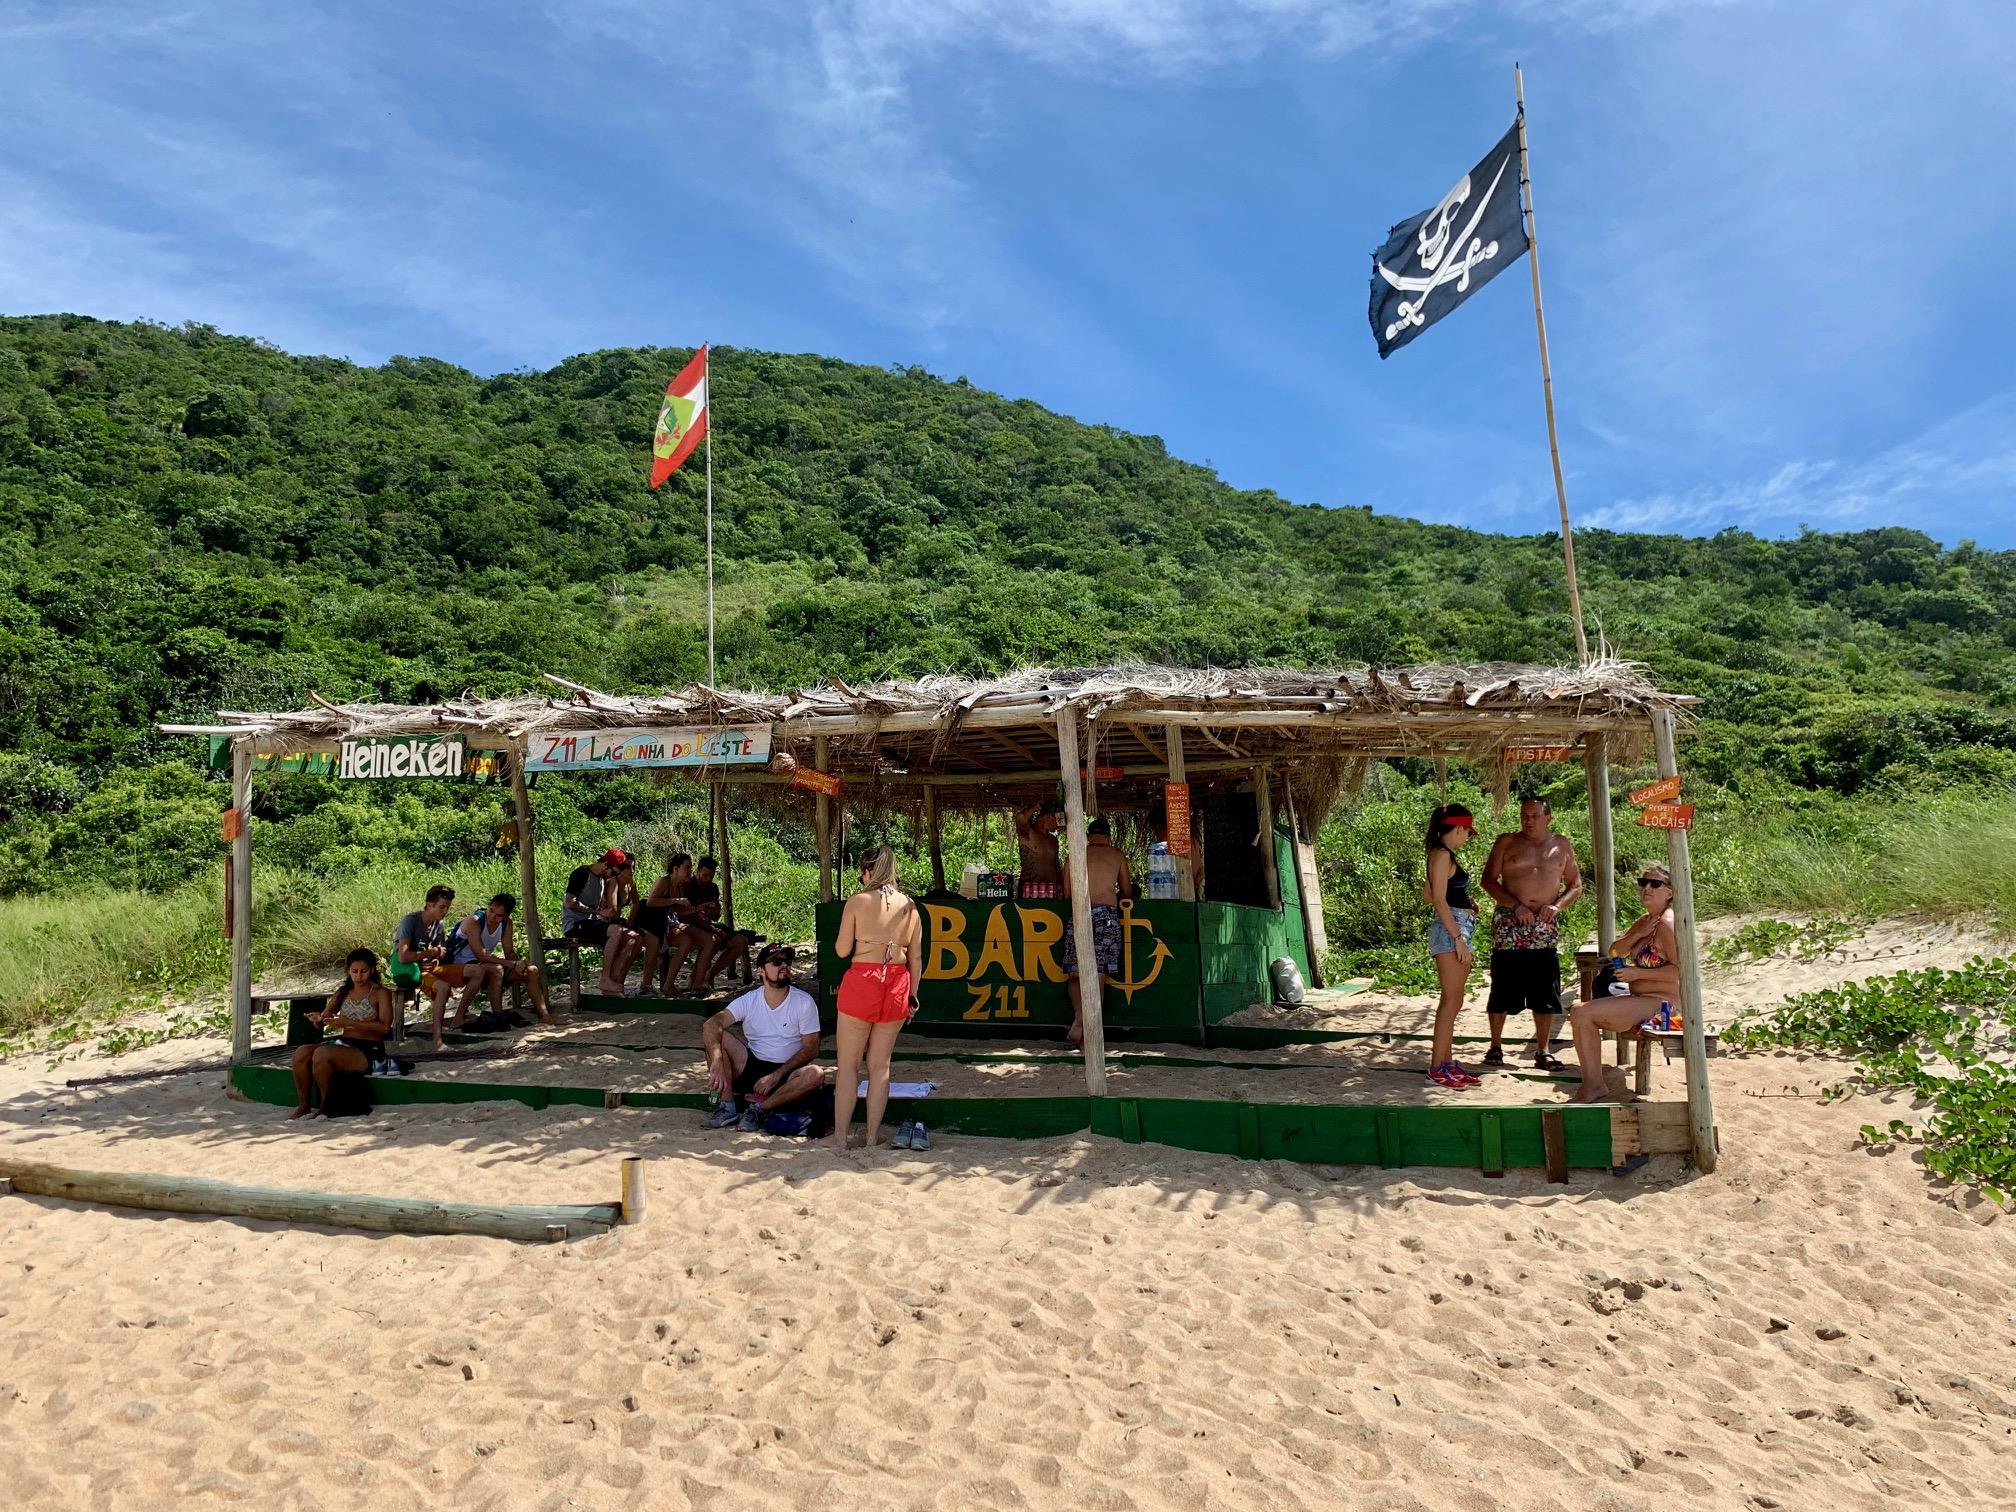 Bar en la Playa de Lagoinha do Leste: CERVEZA a 10 R$